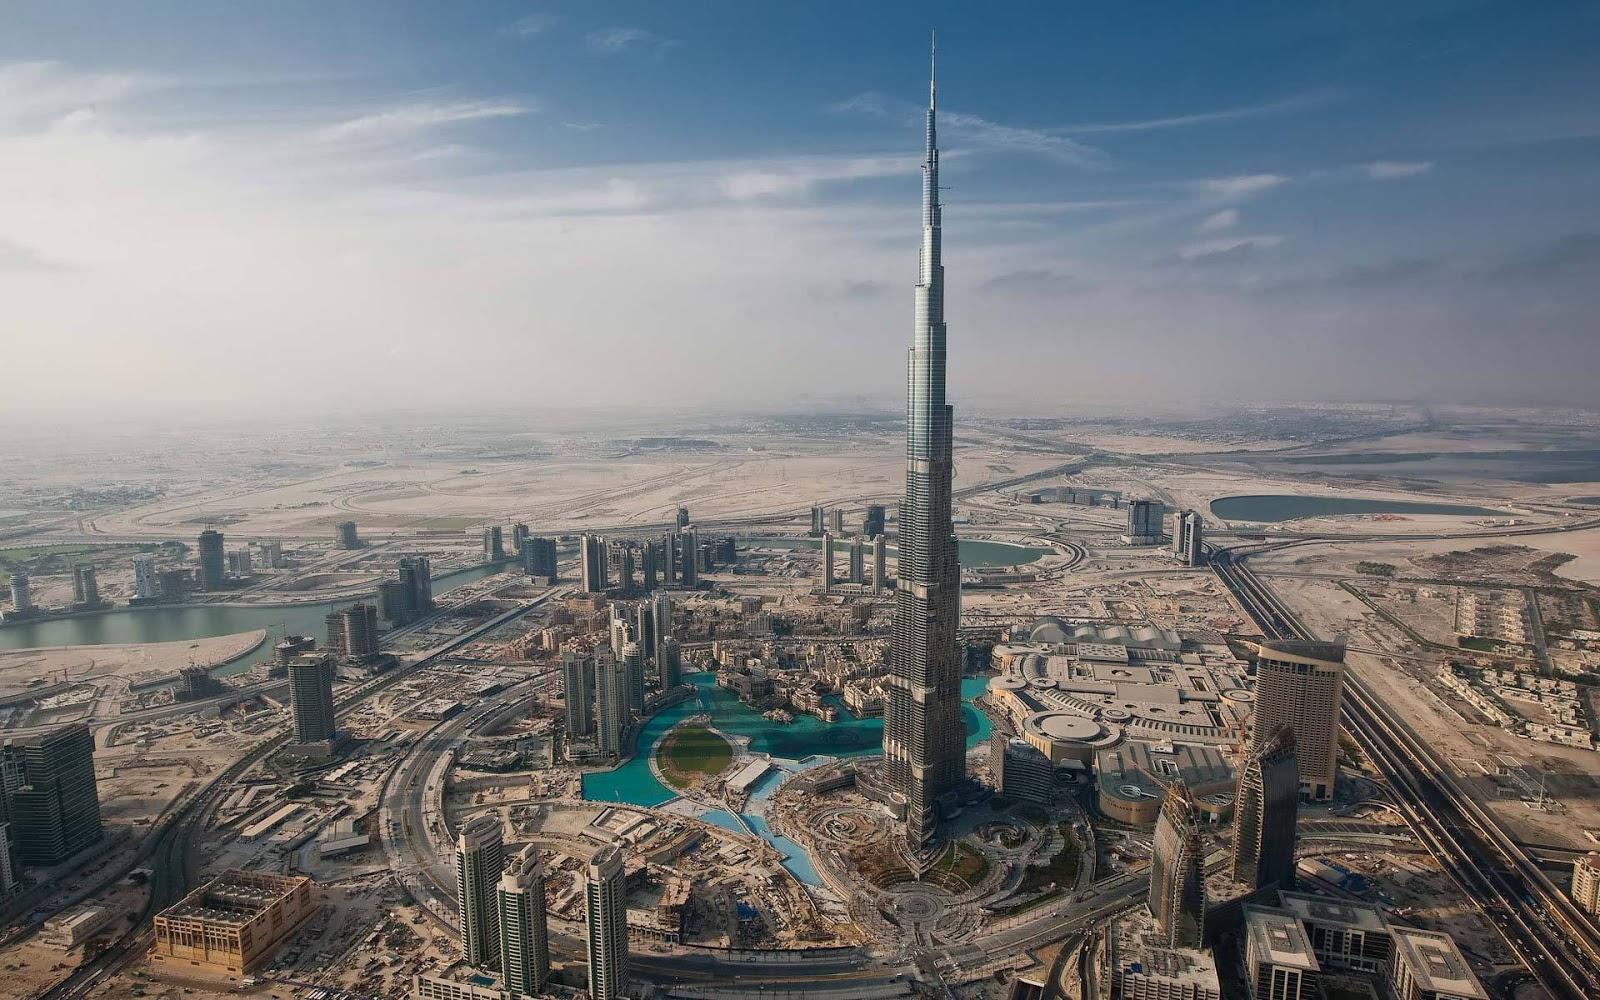 Burj Khalifa HD Wallpaper Wallpaper Size 1600x1000 AmazingPictcom 1600x1000